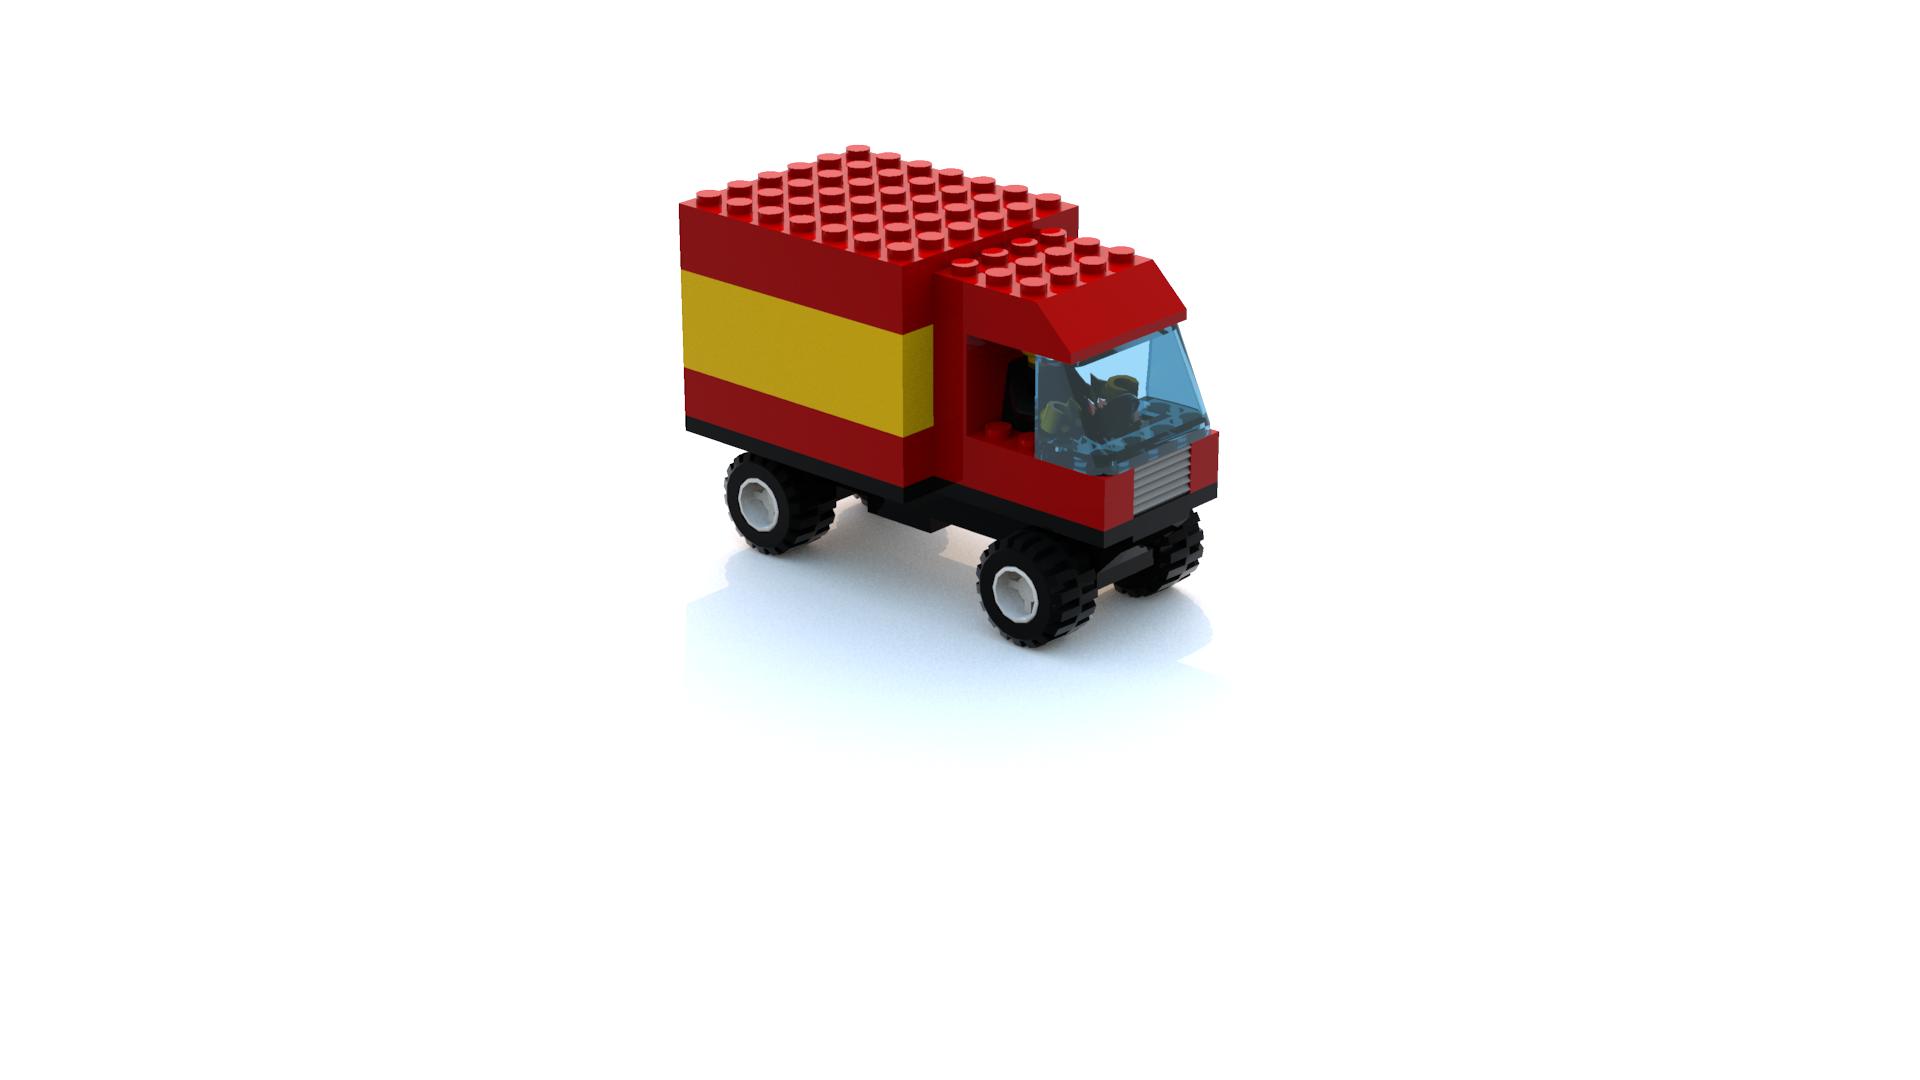 Lego Racers 2 Mike The Postman's Truck LDD Model